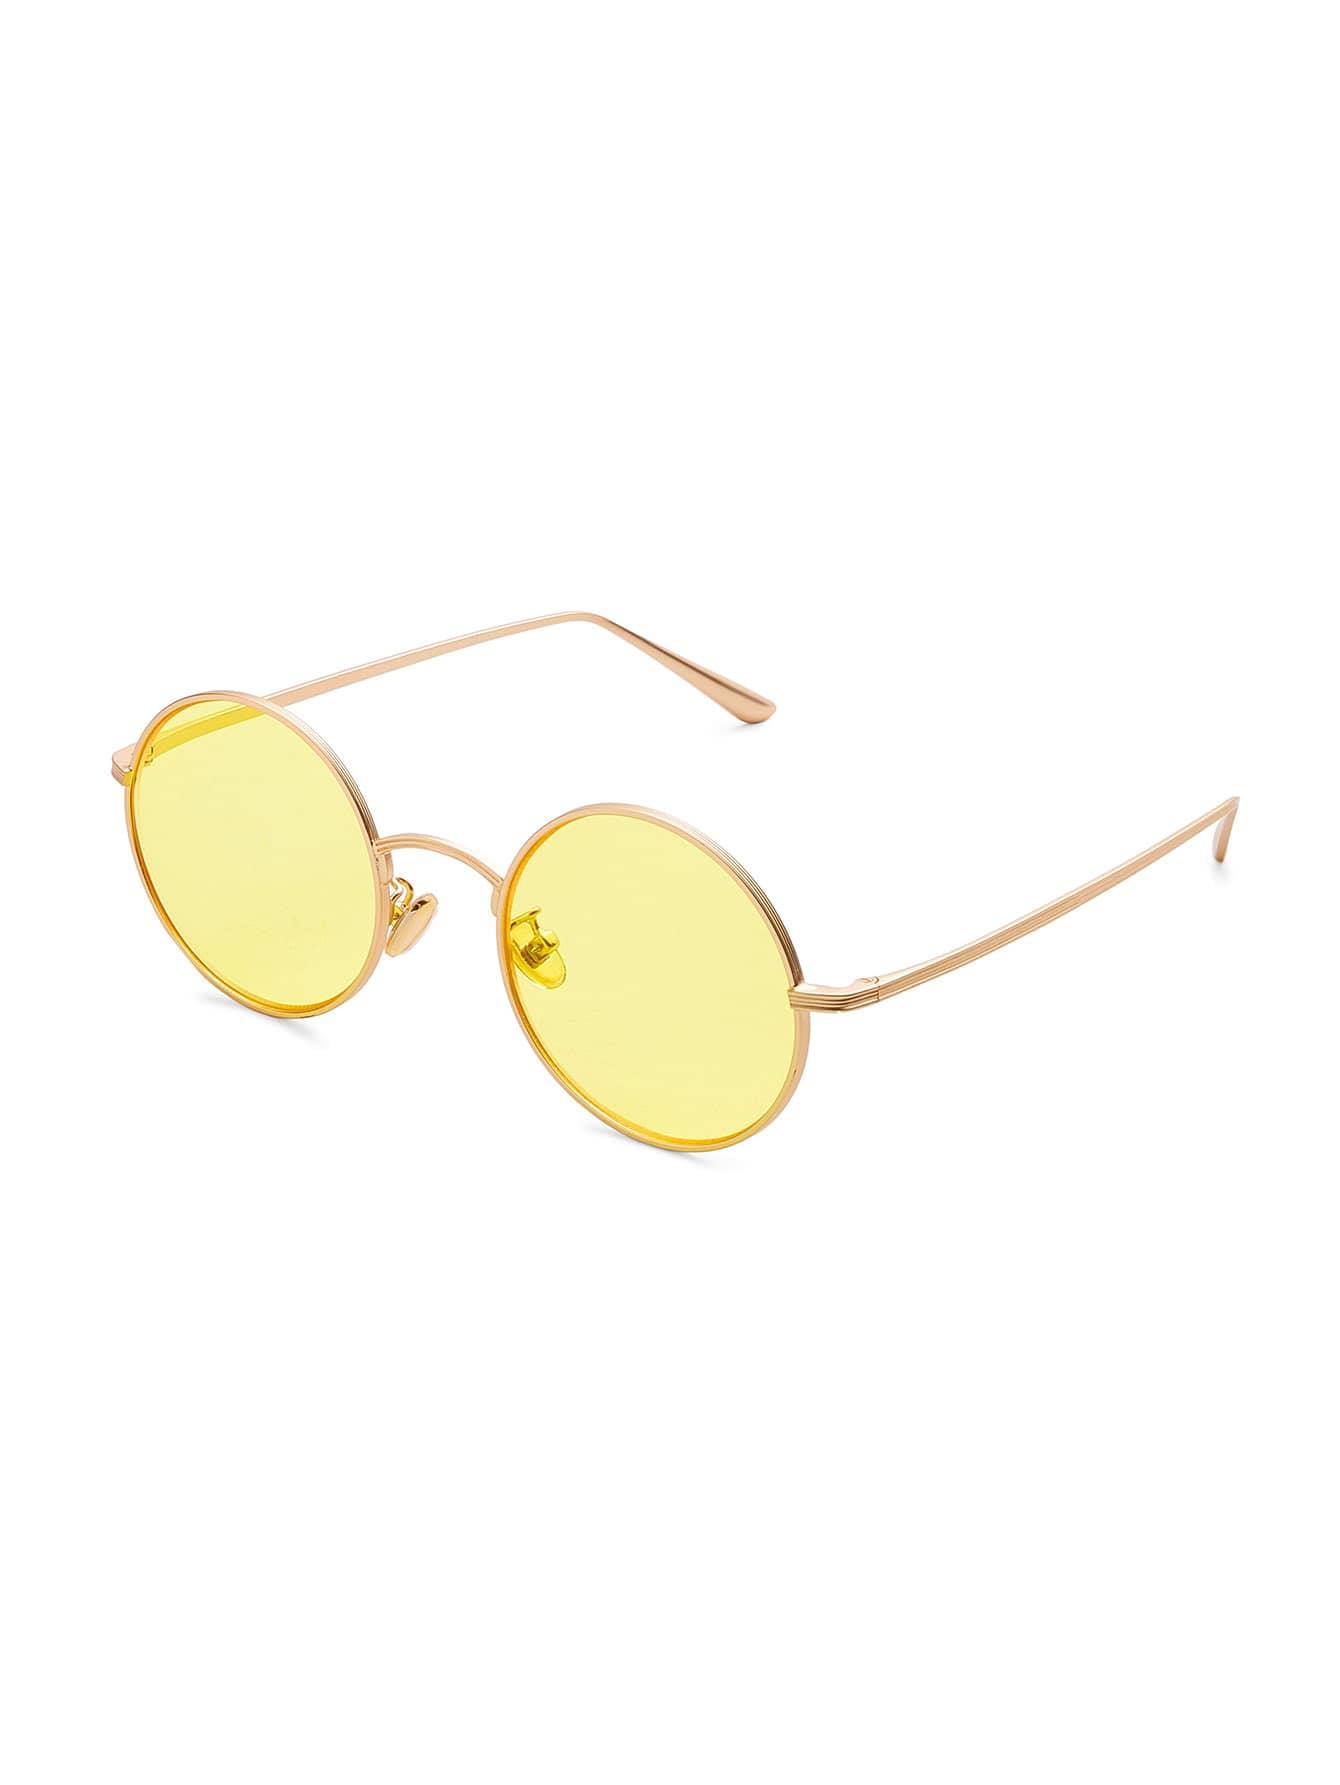 Tinted Lens Round Sunglasses